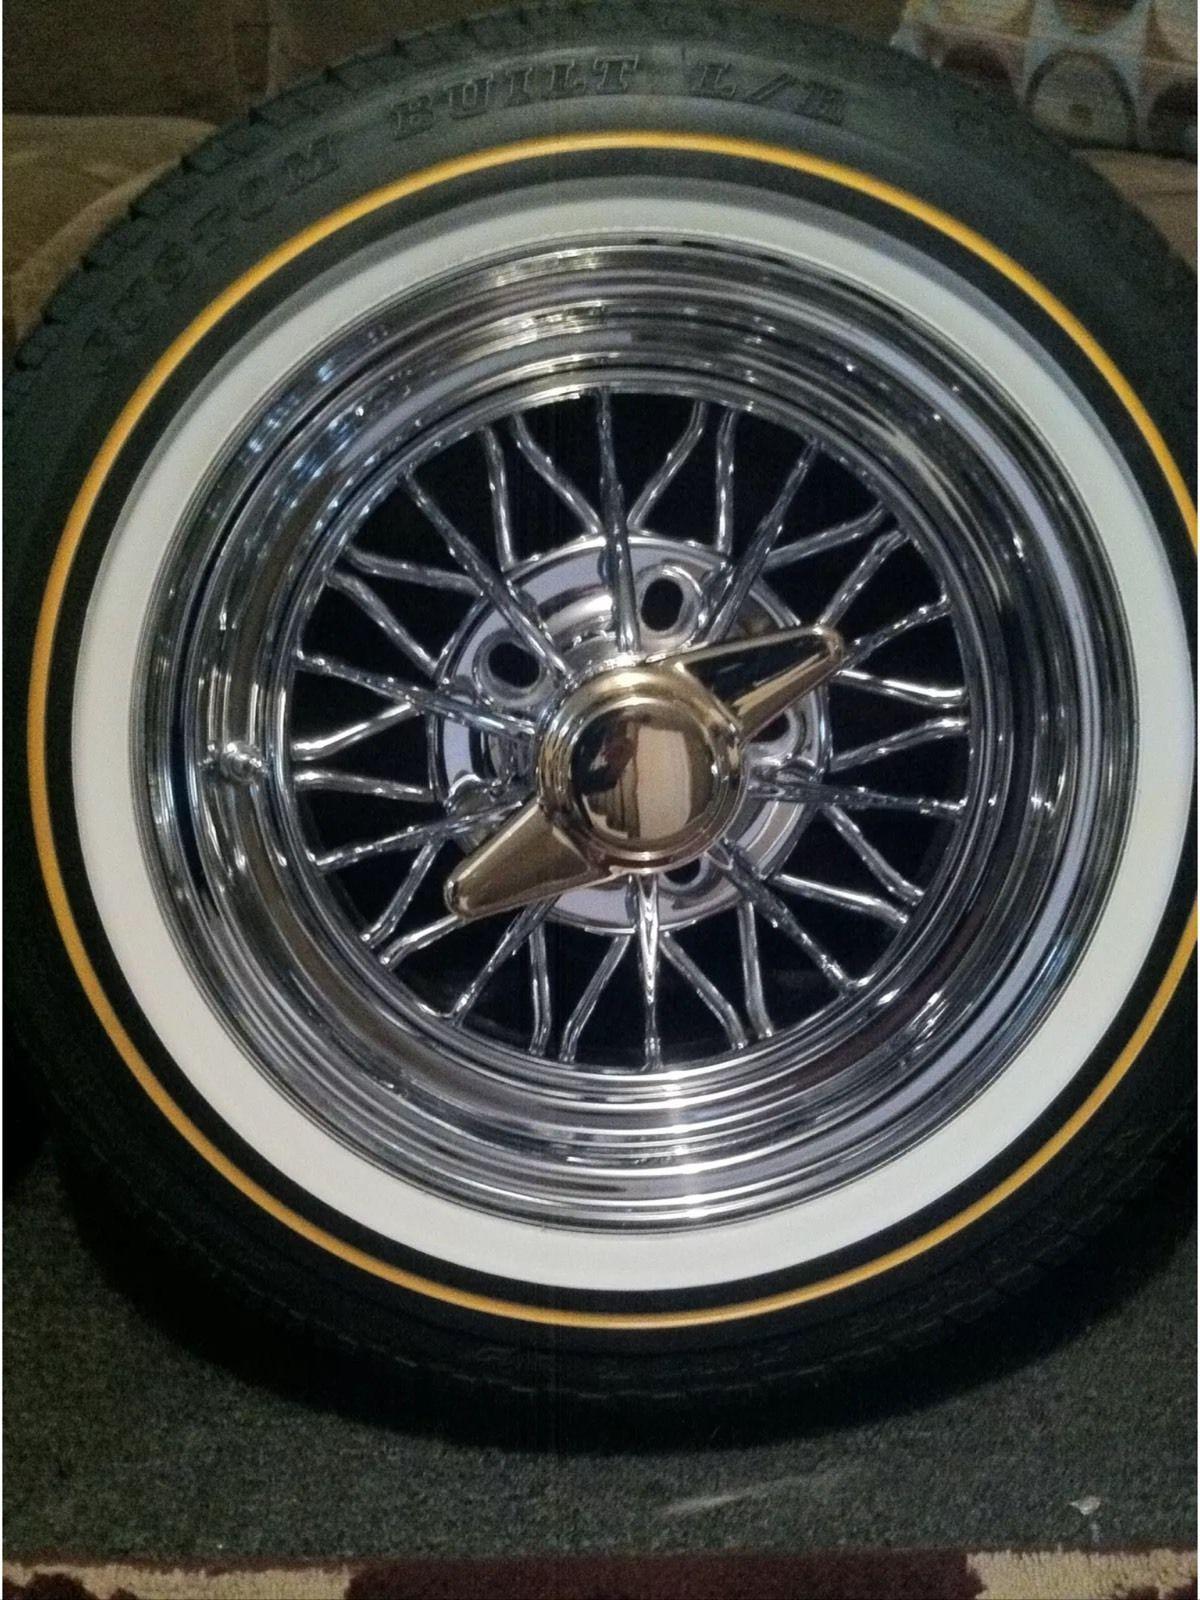 14x6 Cragar 30 Spoke Starwire Wheels With Vogue Tires Www Chopshopmagazine Com Wheel Cool Old Cars Custom Classic Cars